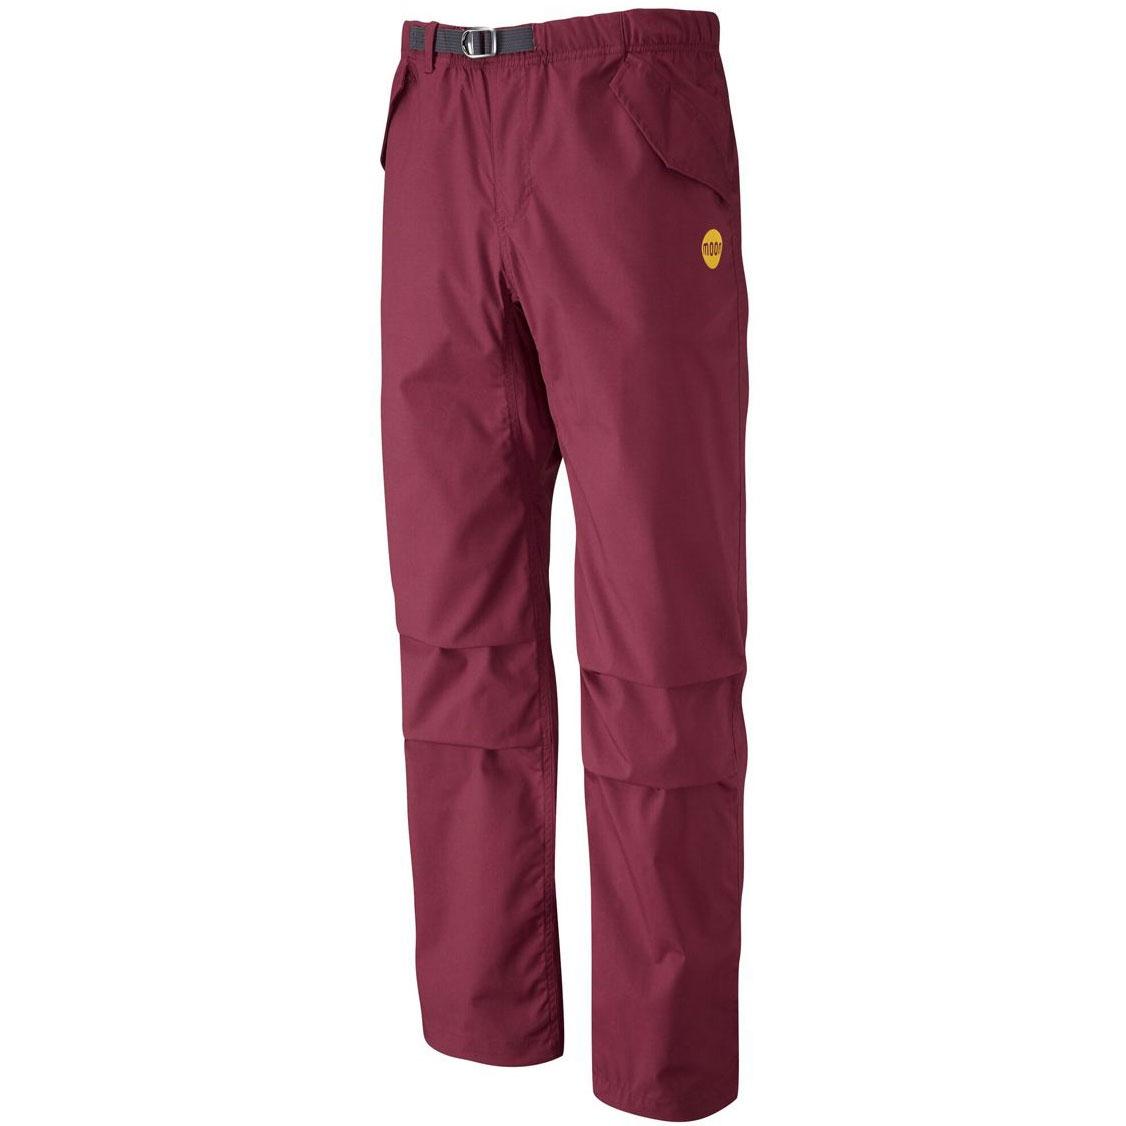 Bouldering & Climbing Trousers